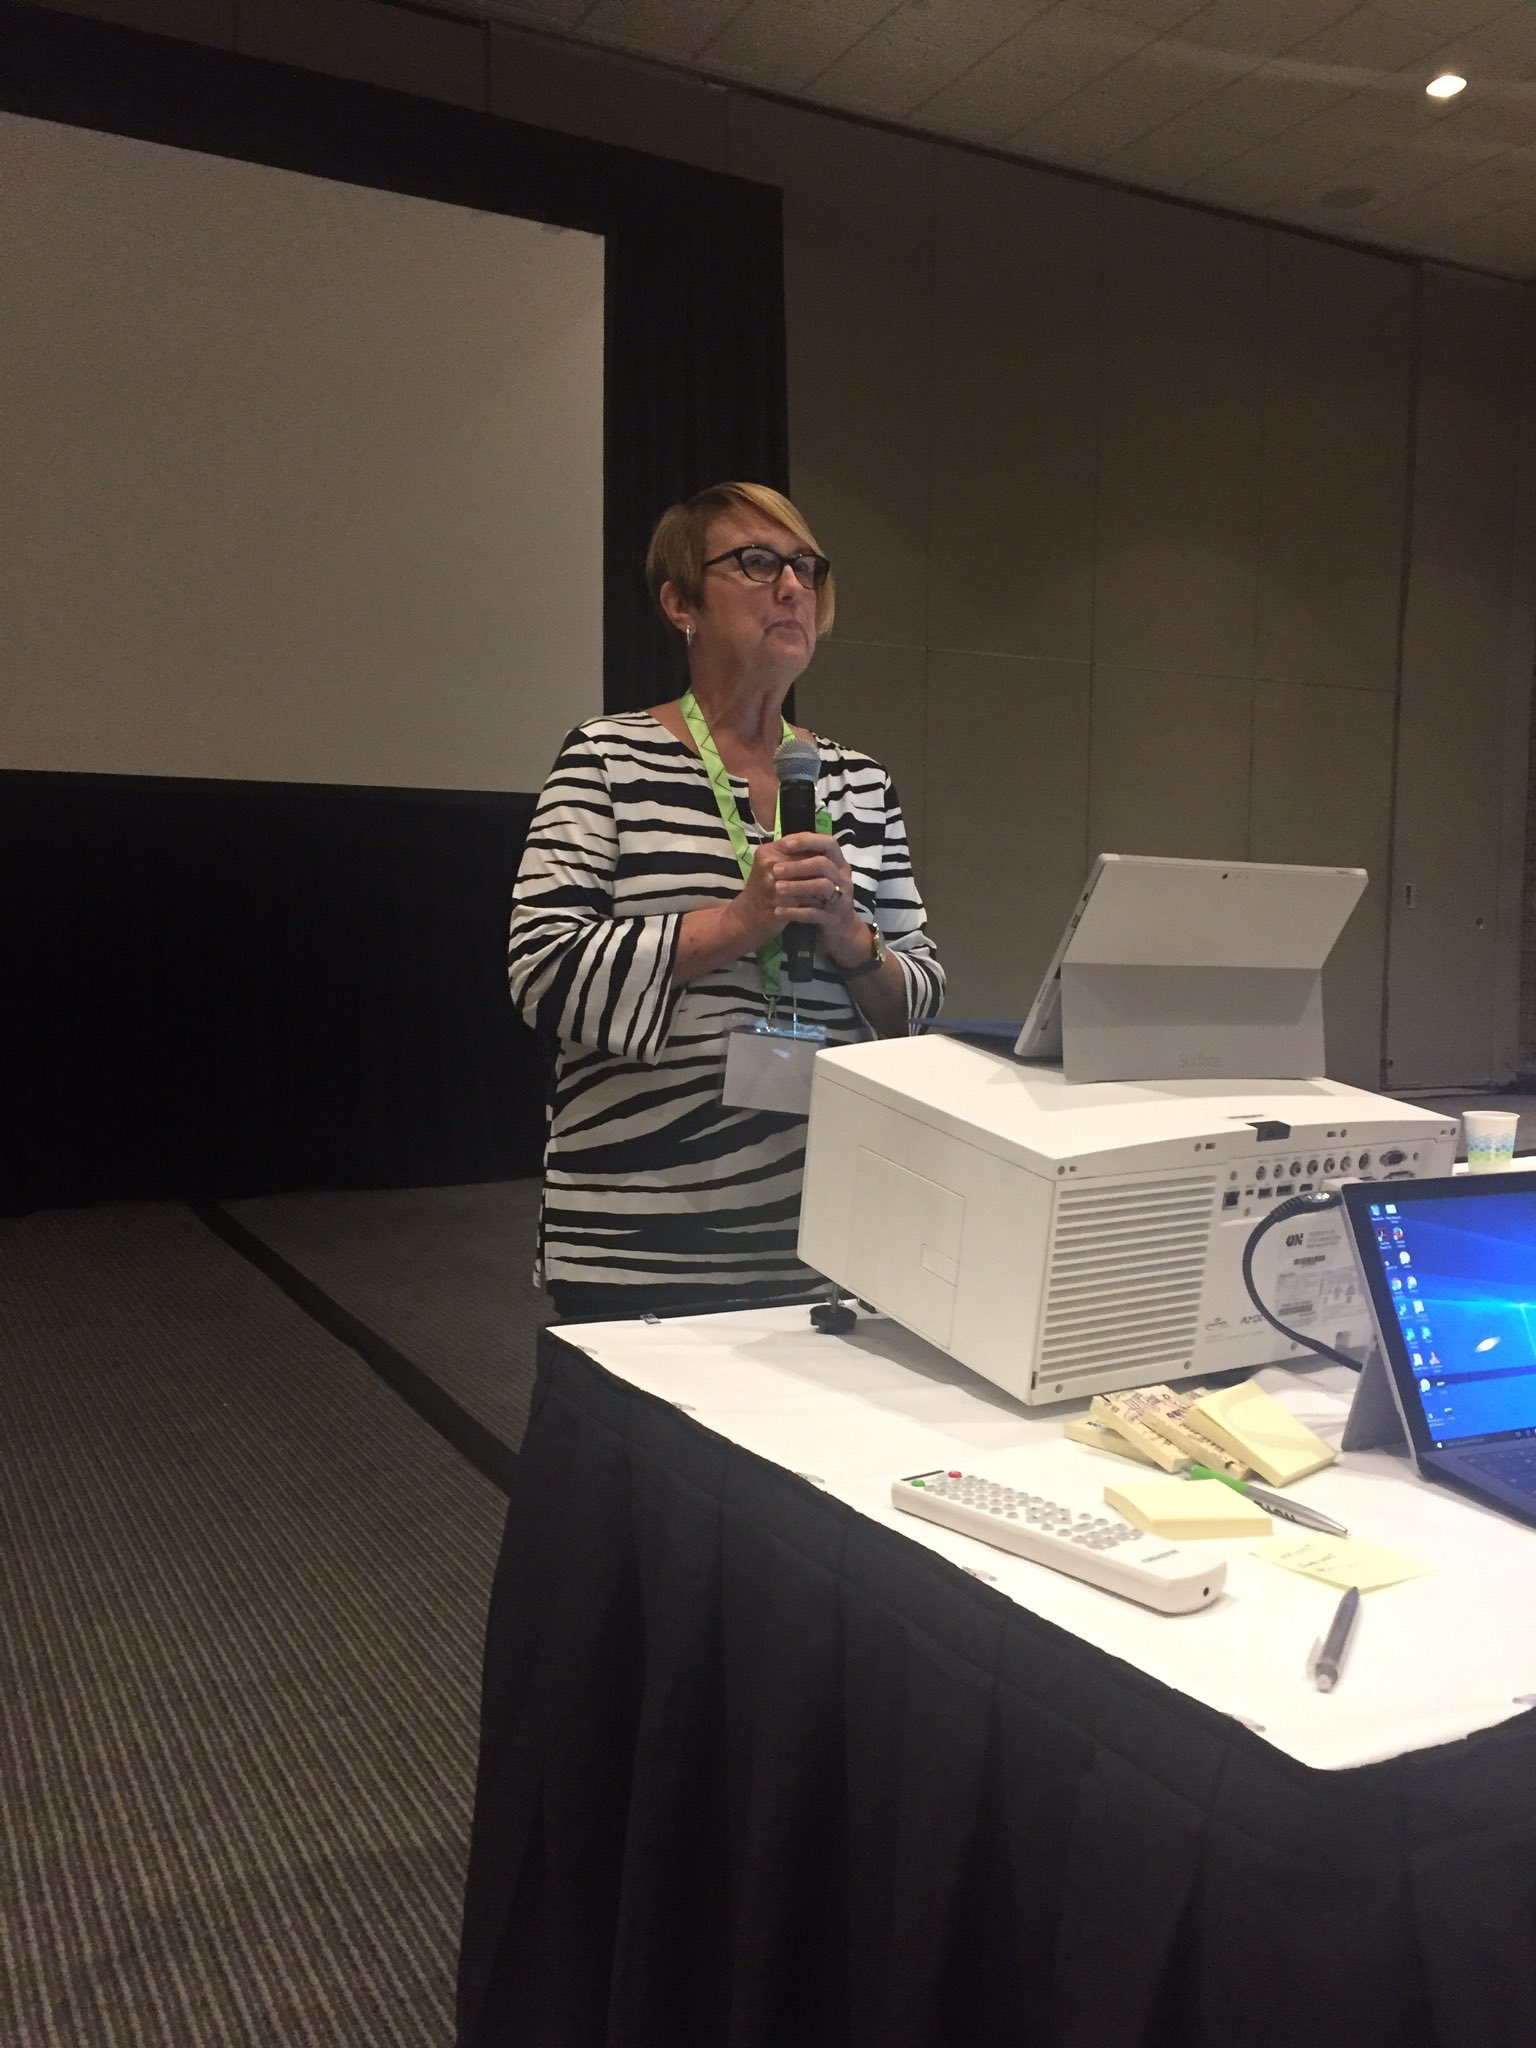 NCTE President Susan Houser welcomes #NCTEaffiliate Leadership Meeting participants. https://t.co/xbffnp8z8D